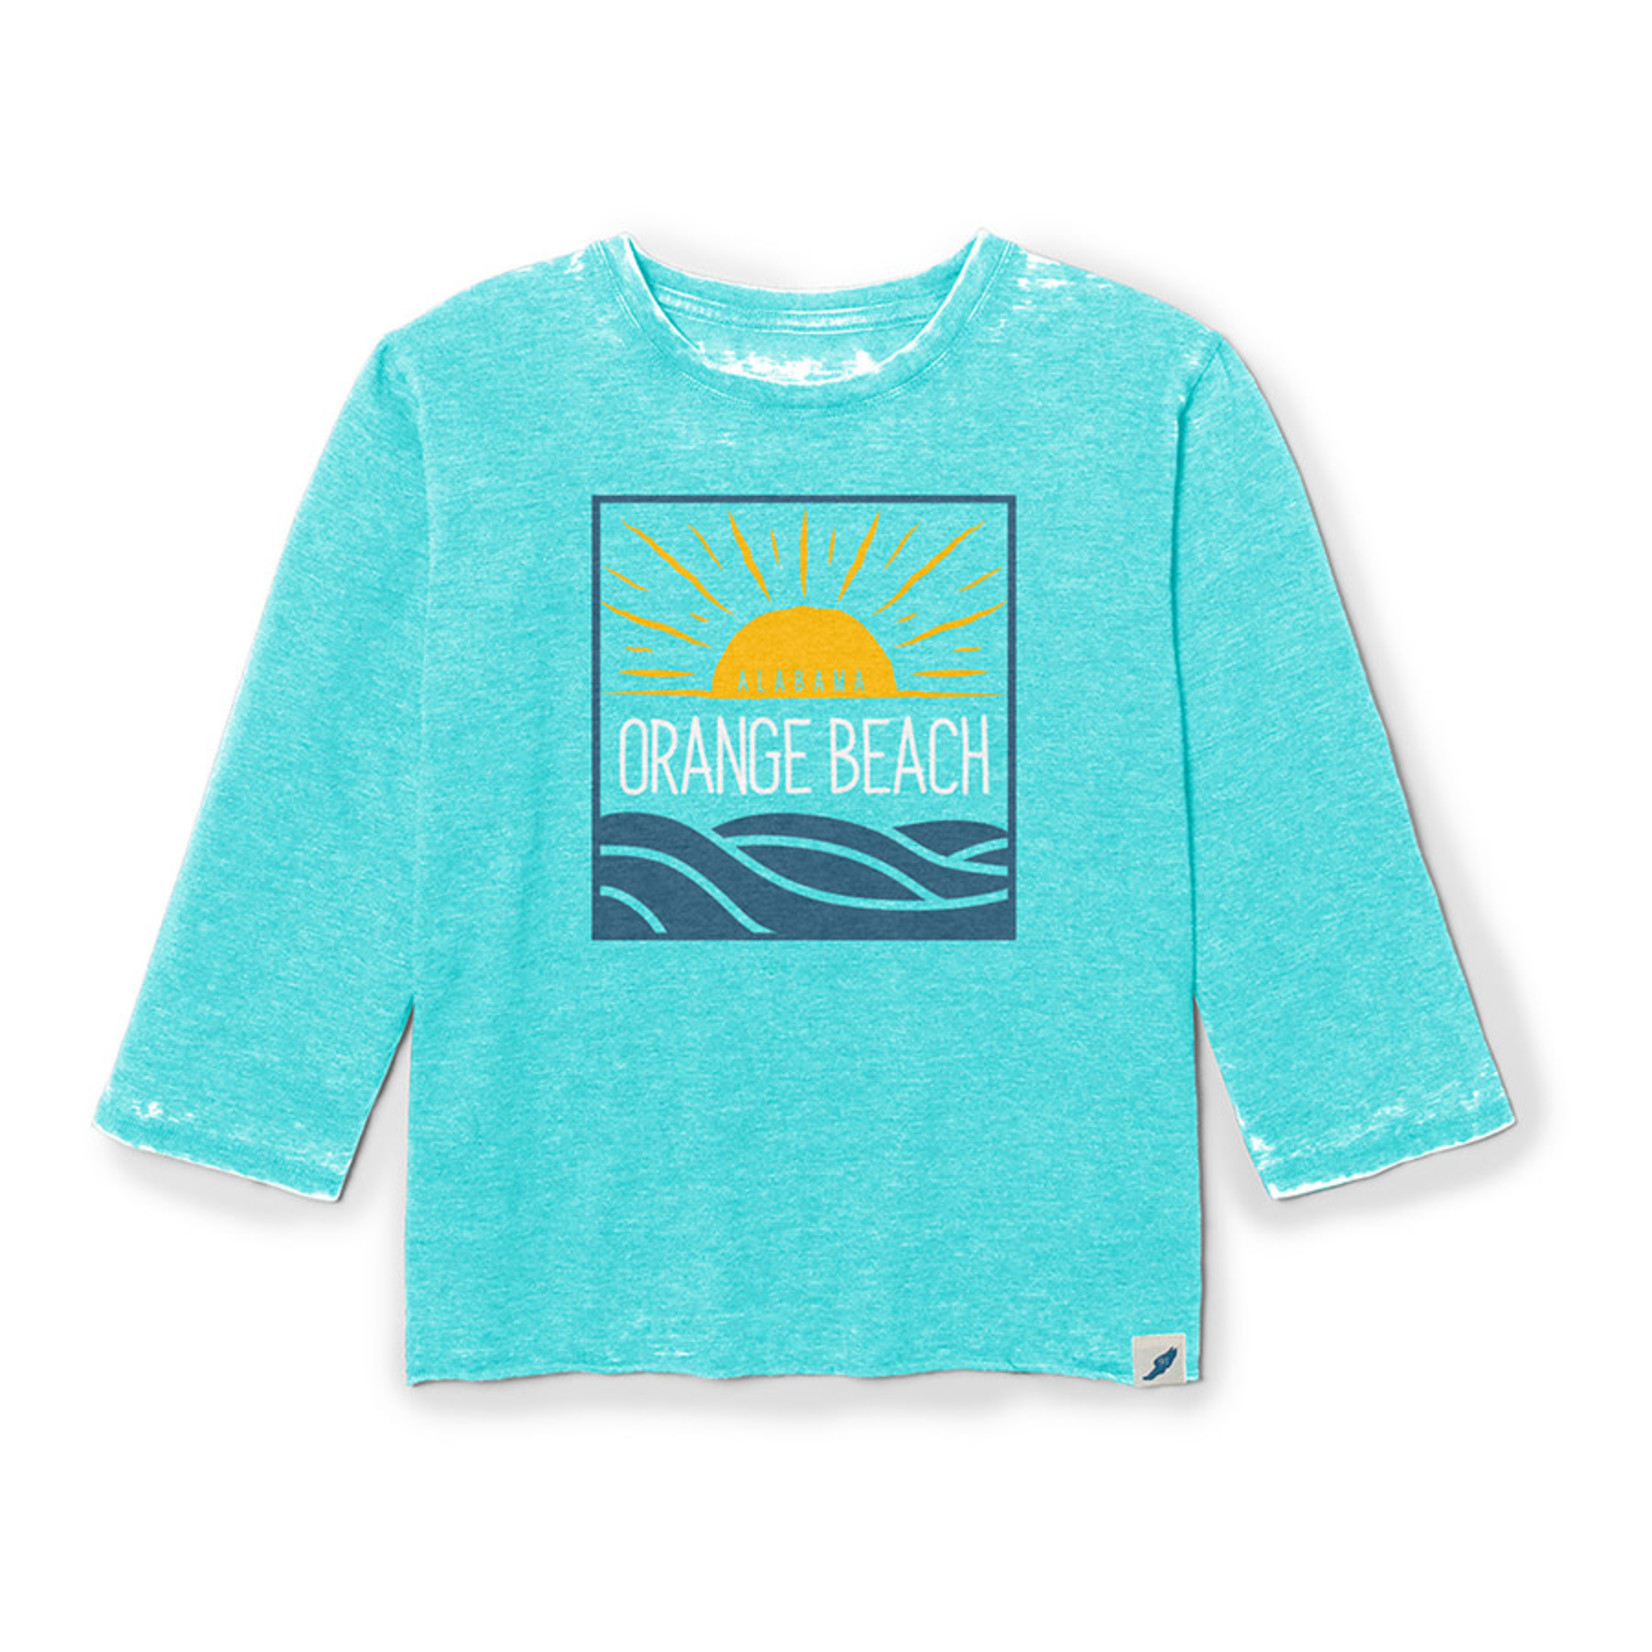 L2 Brands Open Water Janice Tee